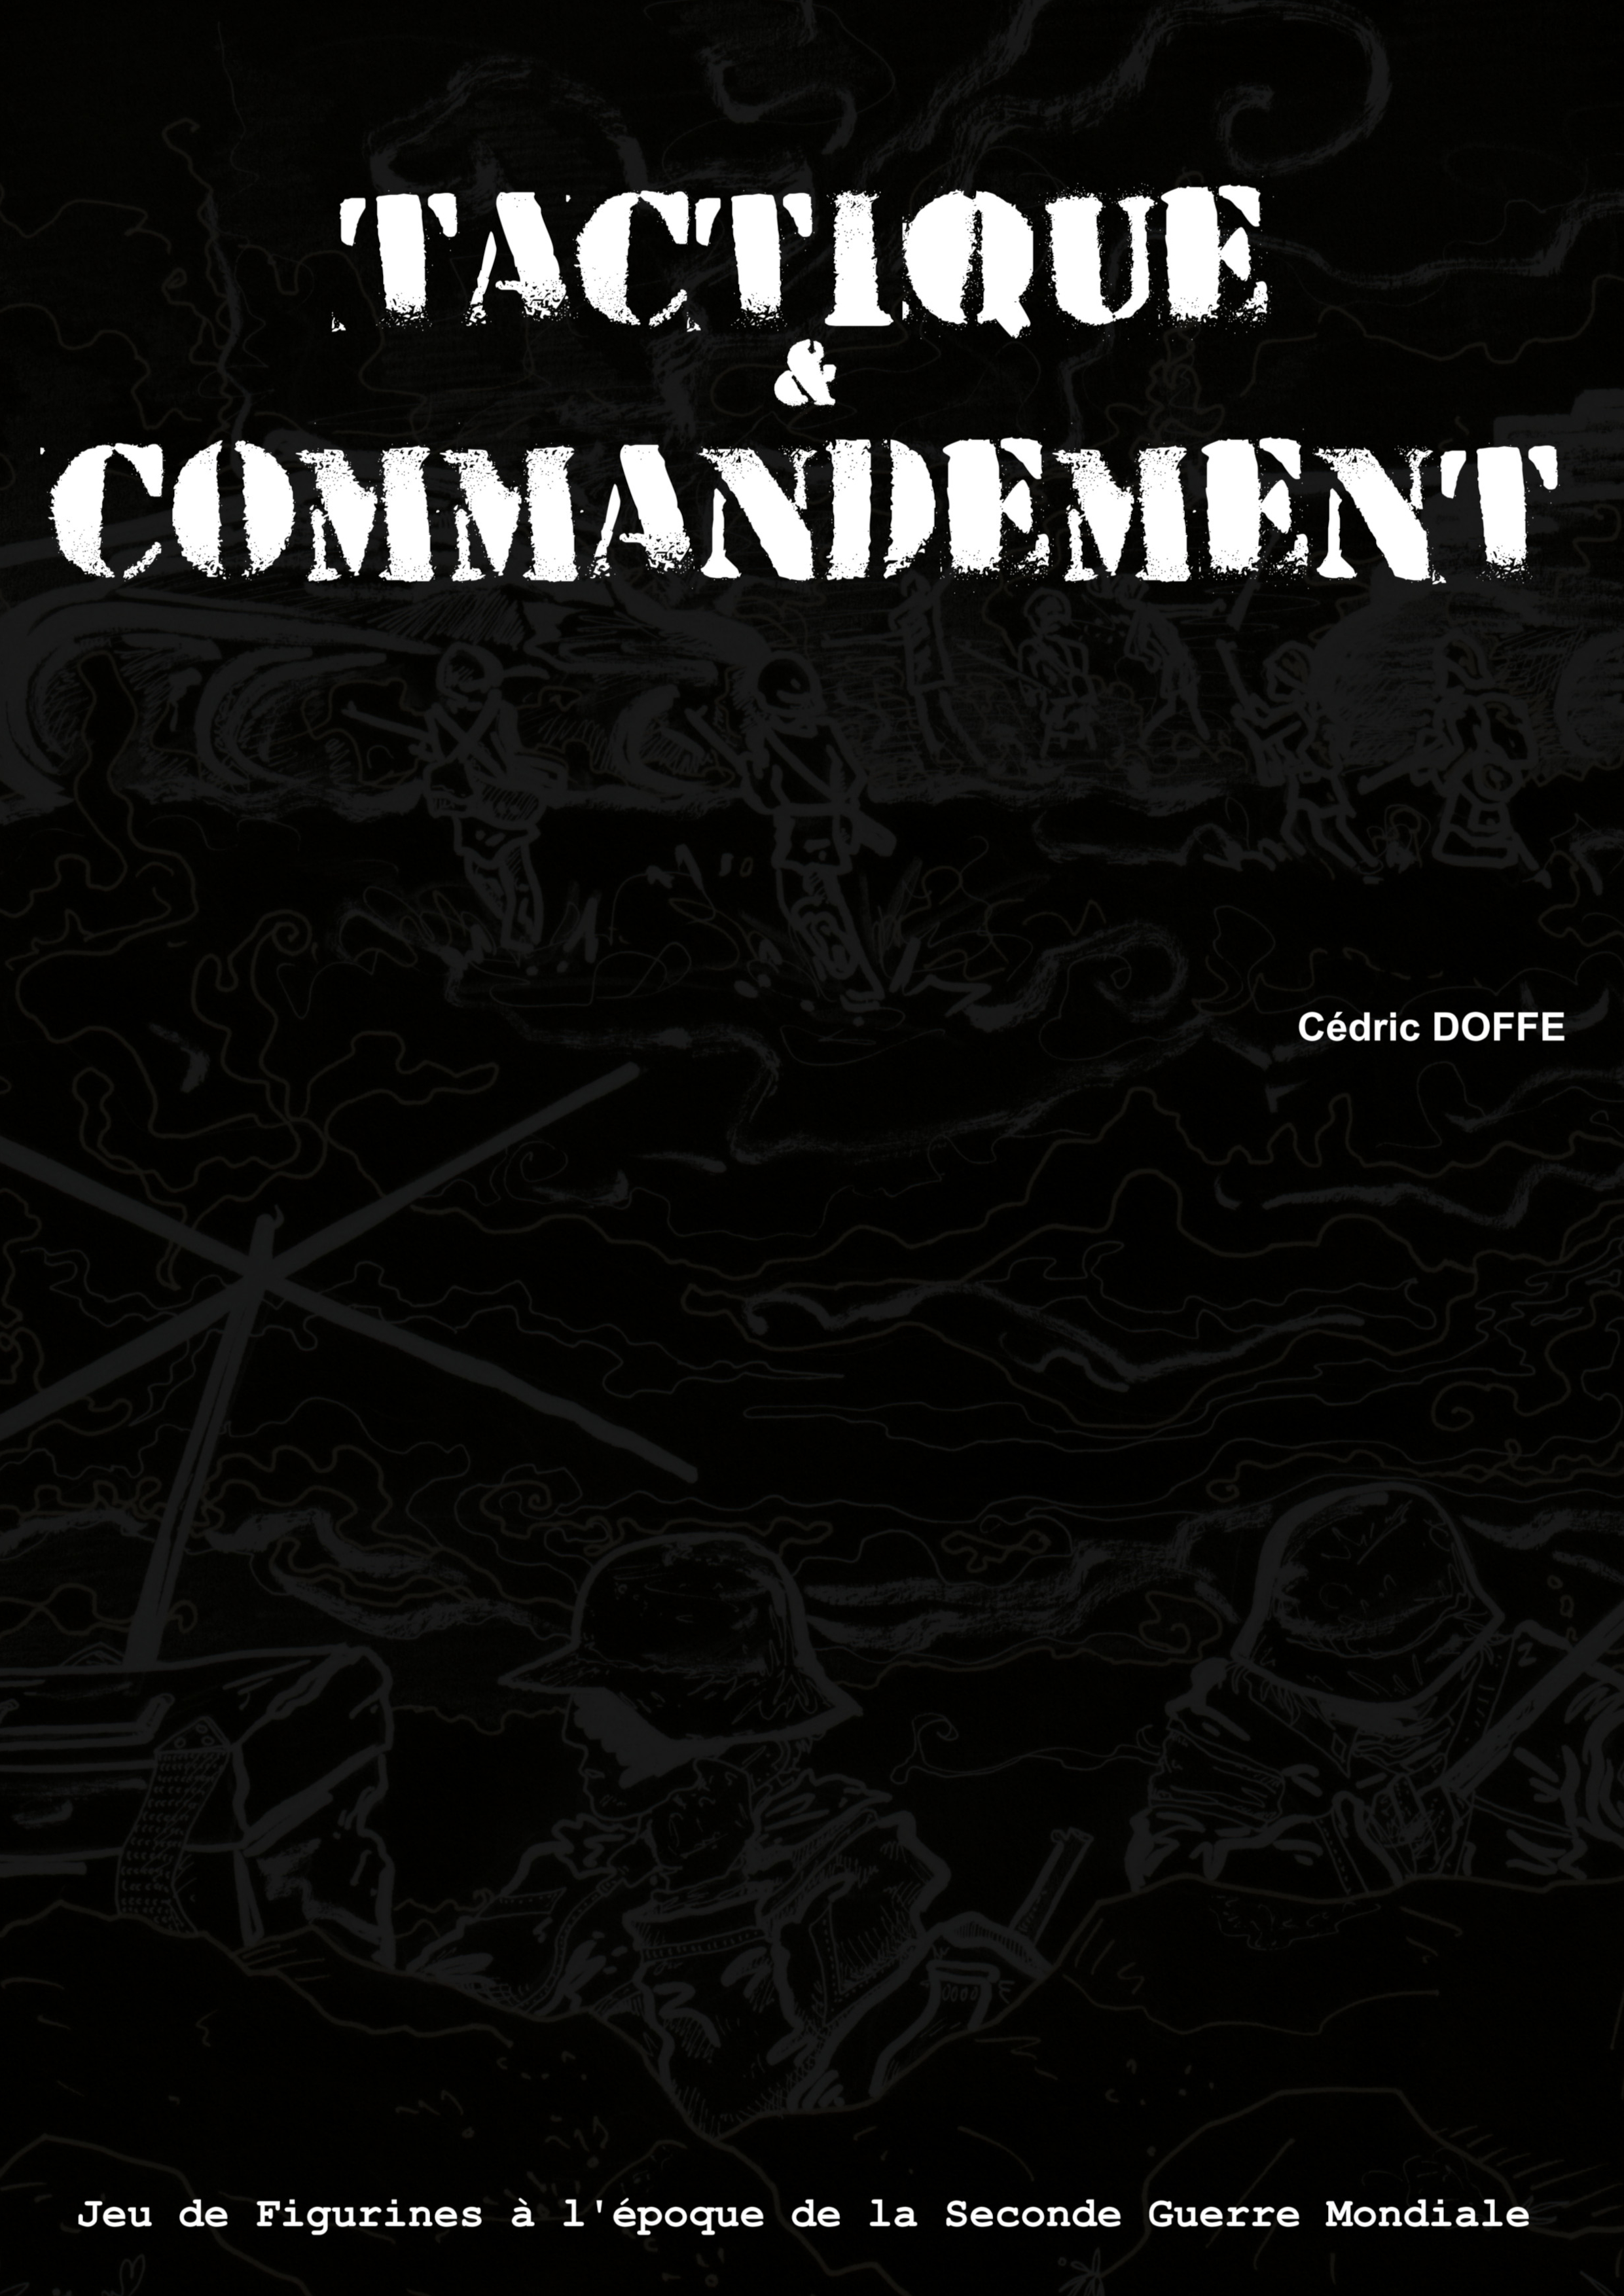 Tactique & Commandement